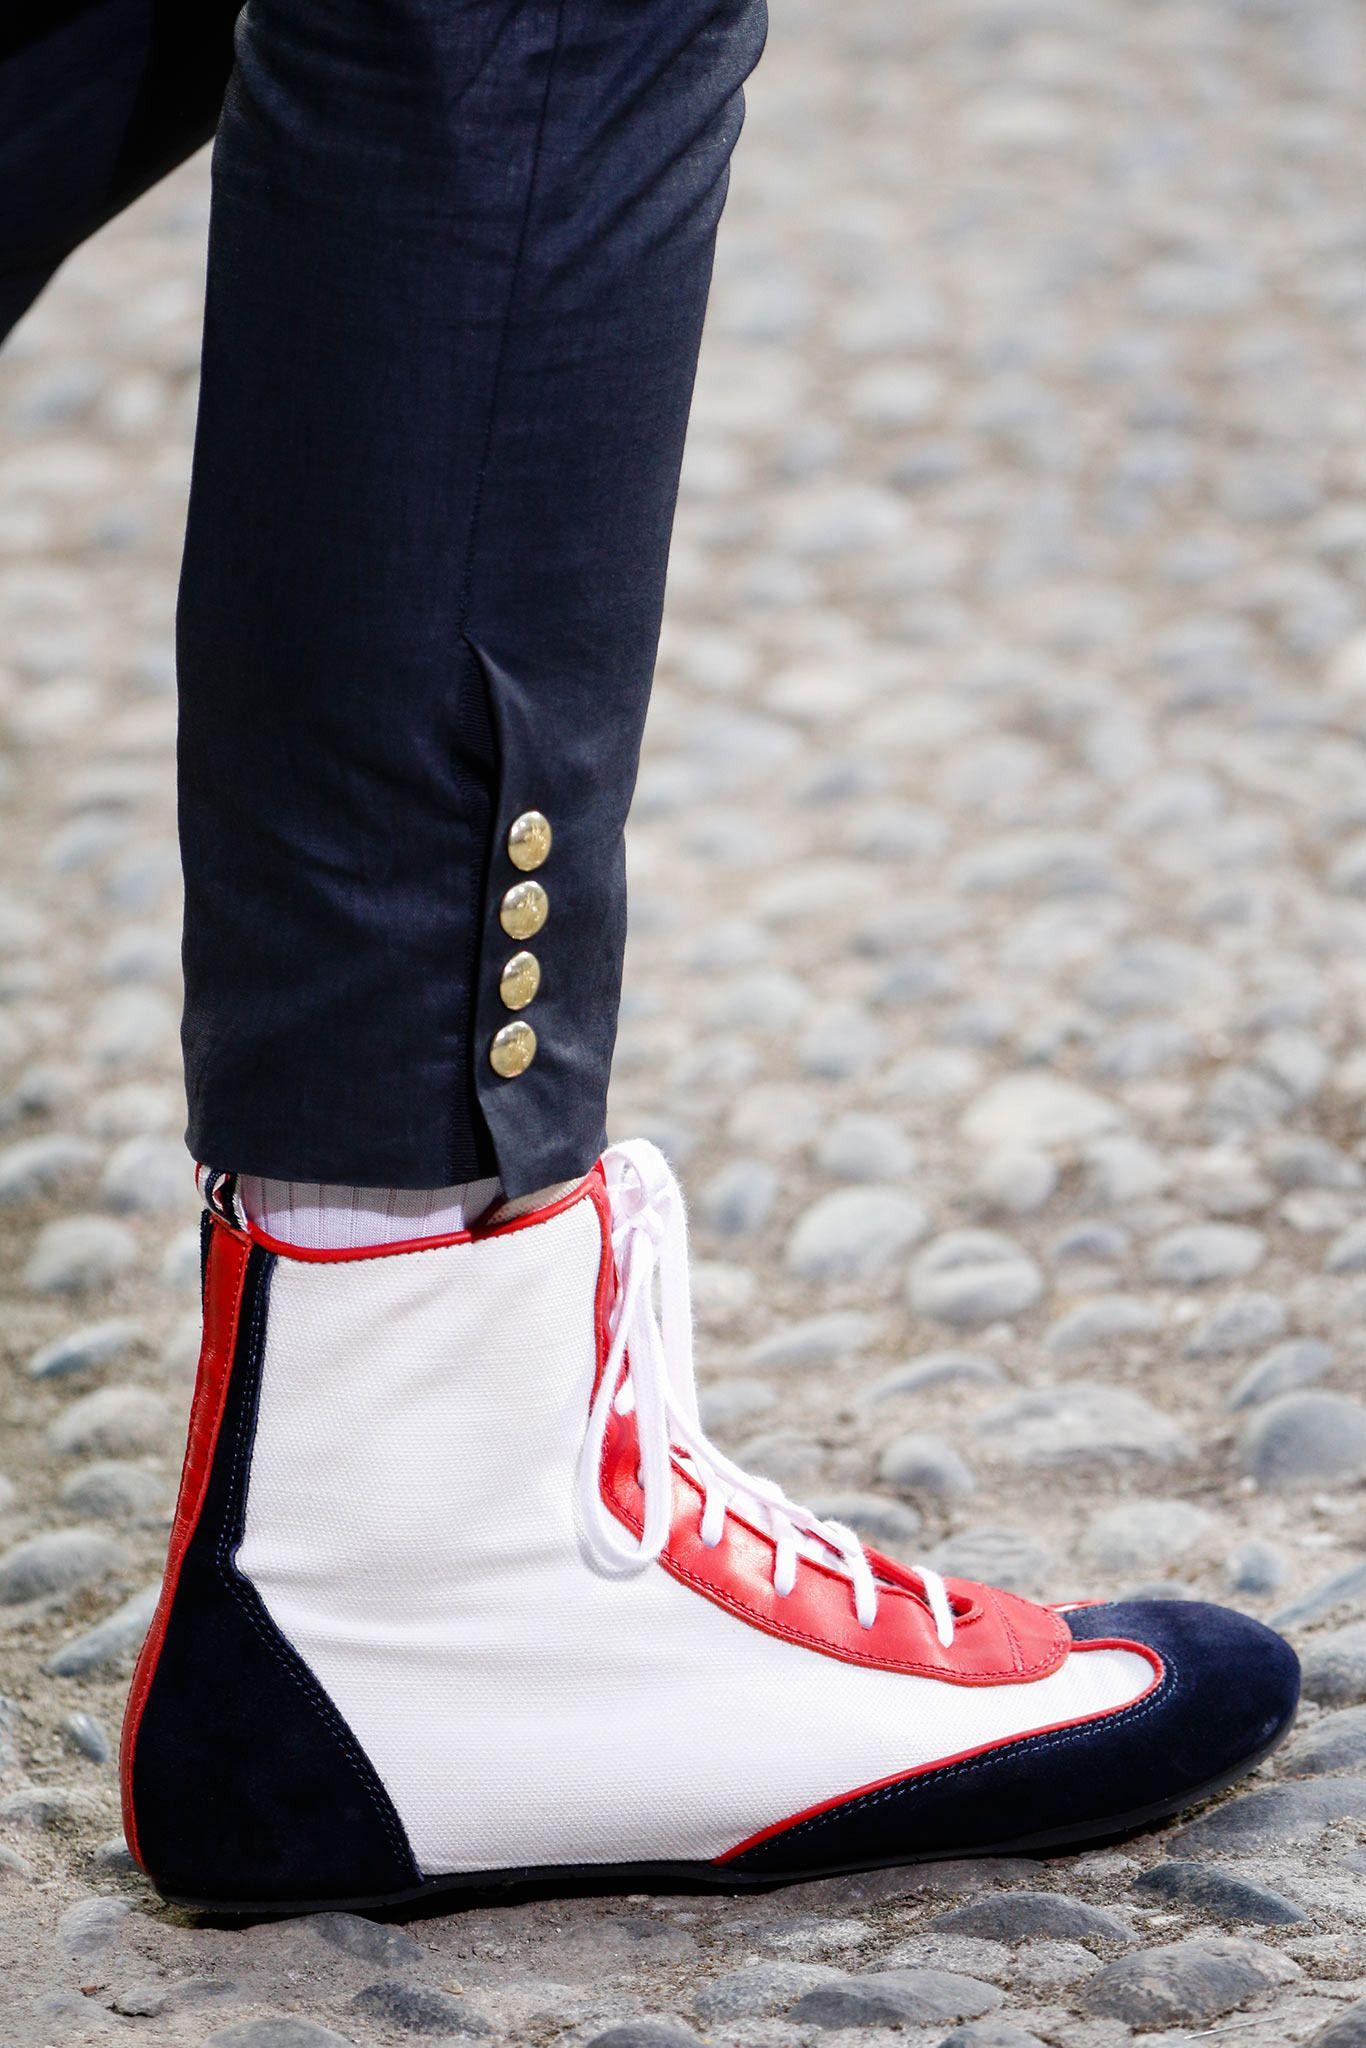 Moncler Gamme Bleu Spring 2015 Menswear